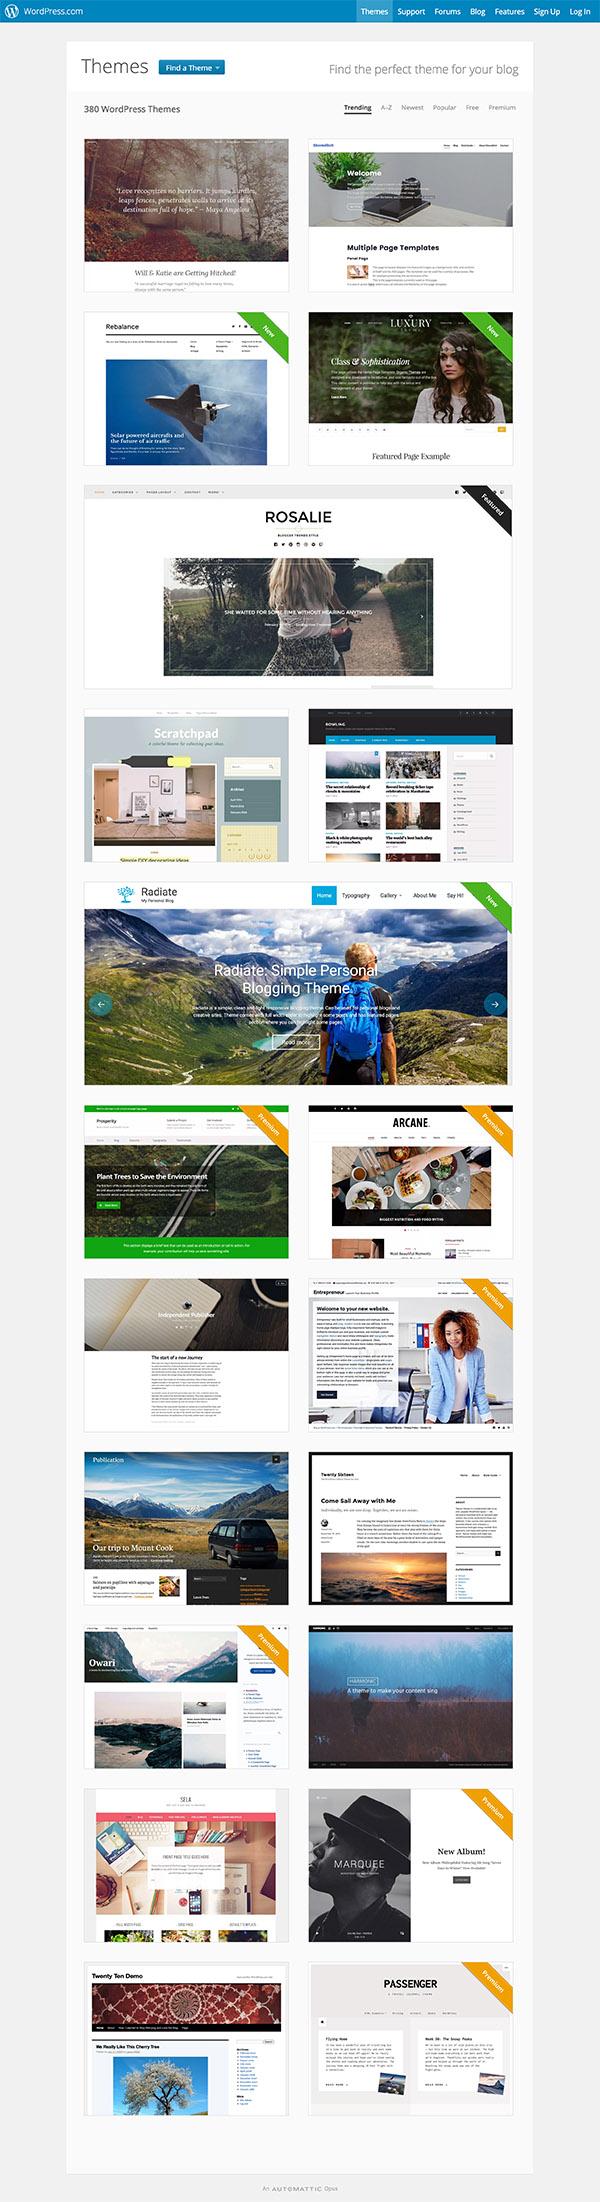 03 Theme WordPress